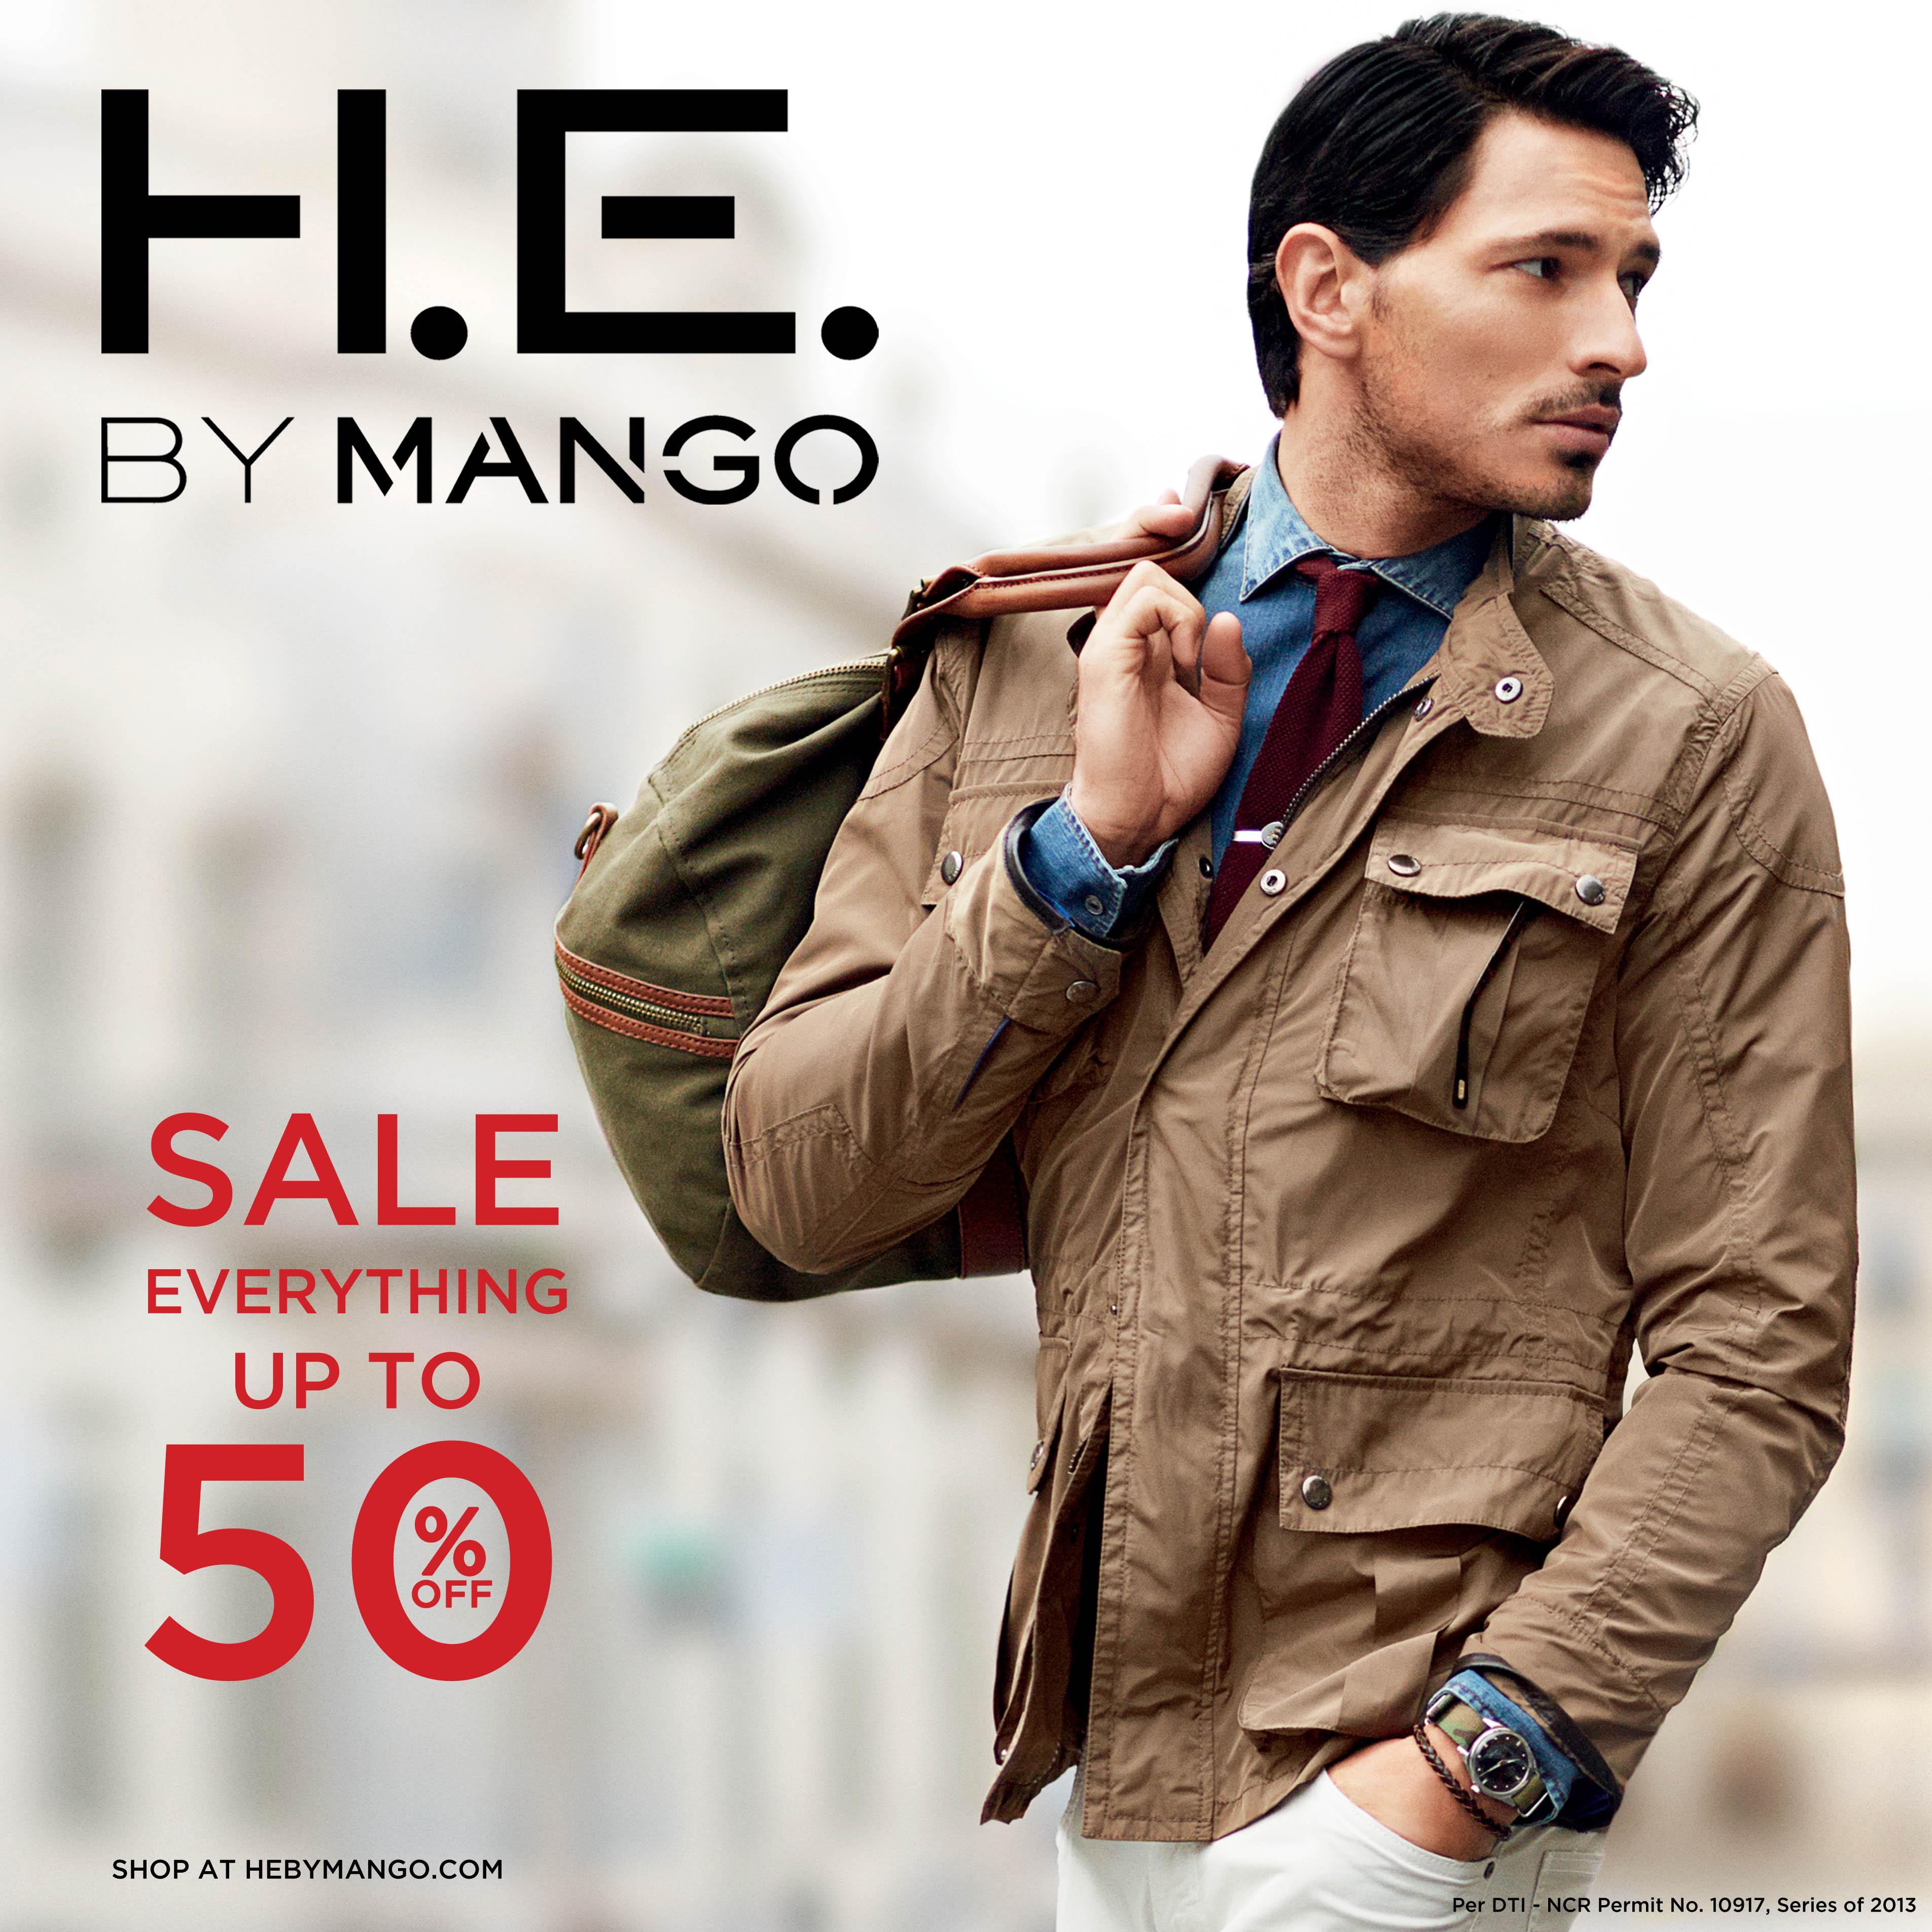 H.E. By Mango End Of Season Sale December - January 2013